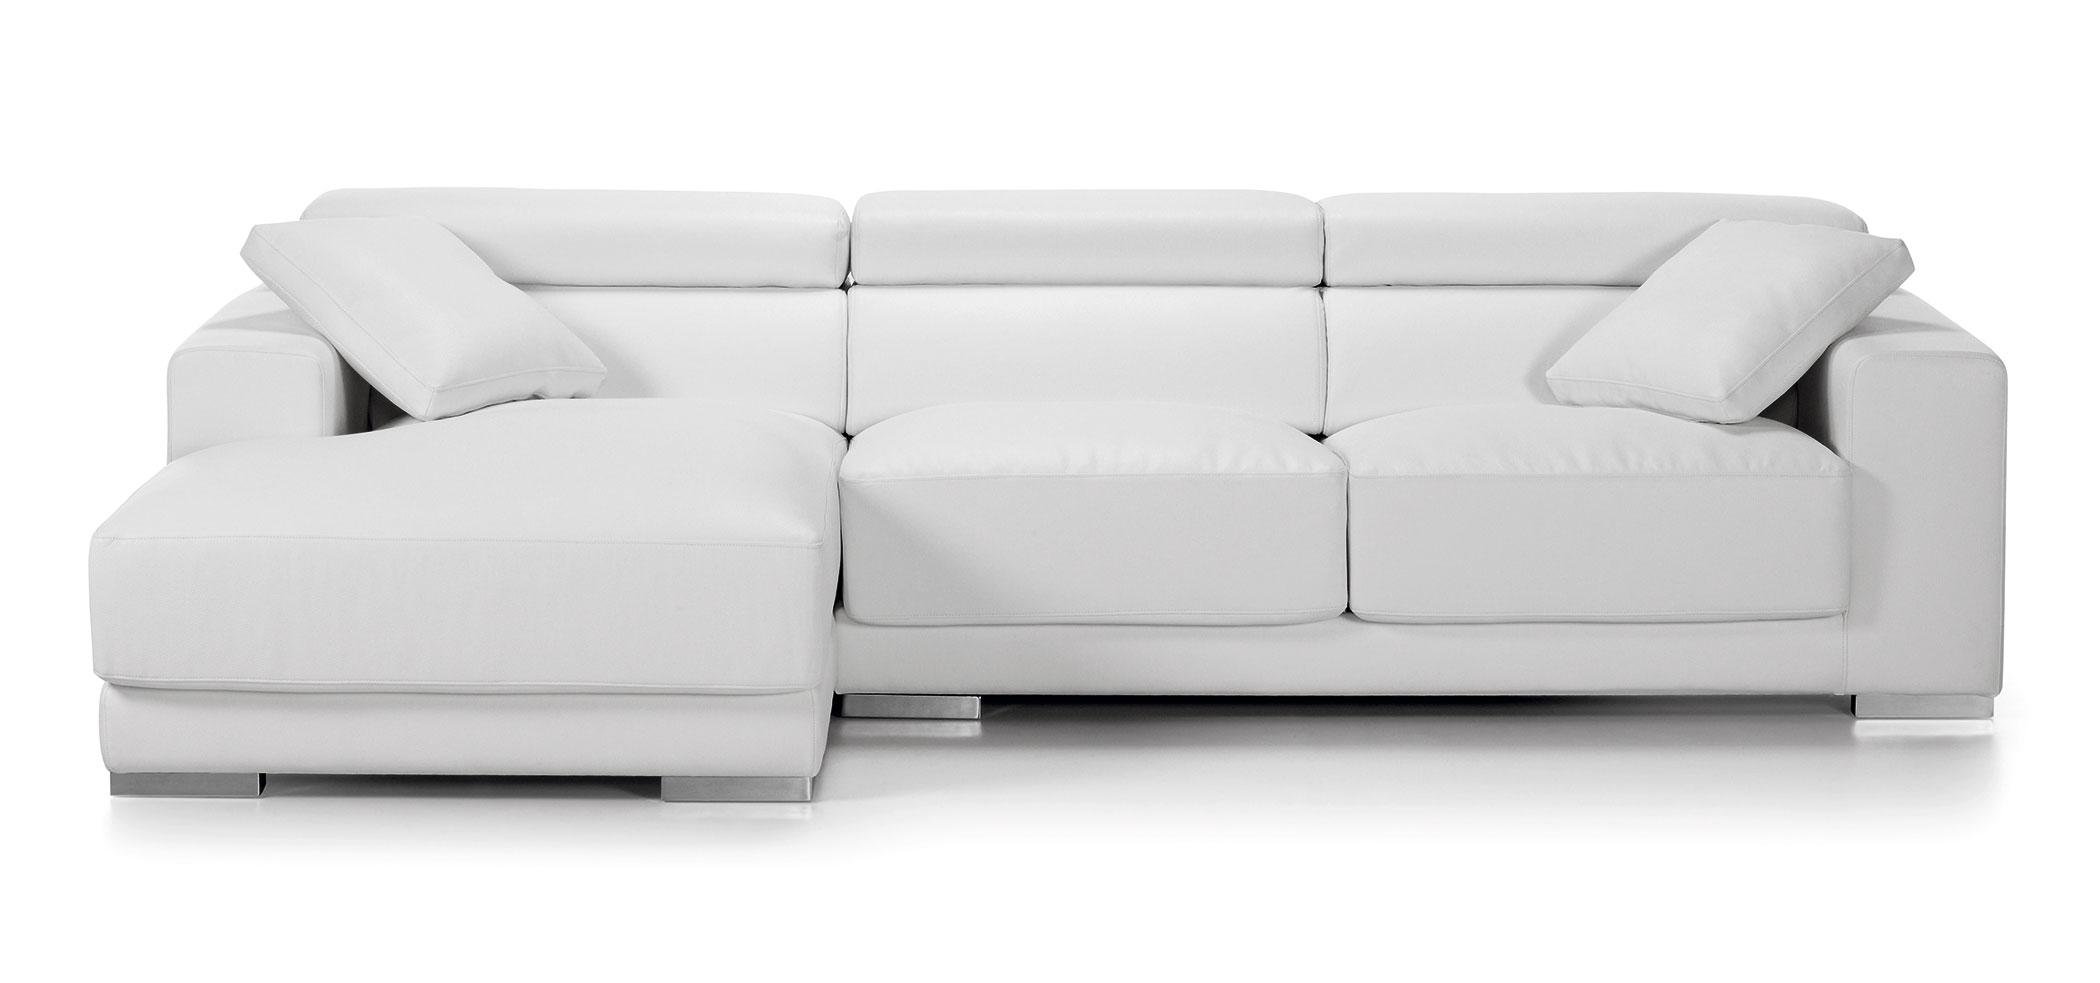 singapore sofa 3p ch izda recl desliz eco piel b puro. Black Bedroom Furniture Sets. Home Design Ideas